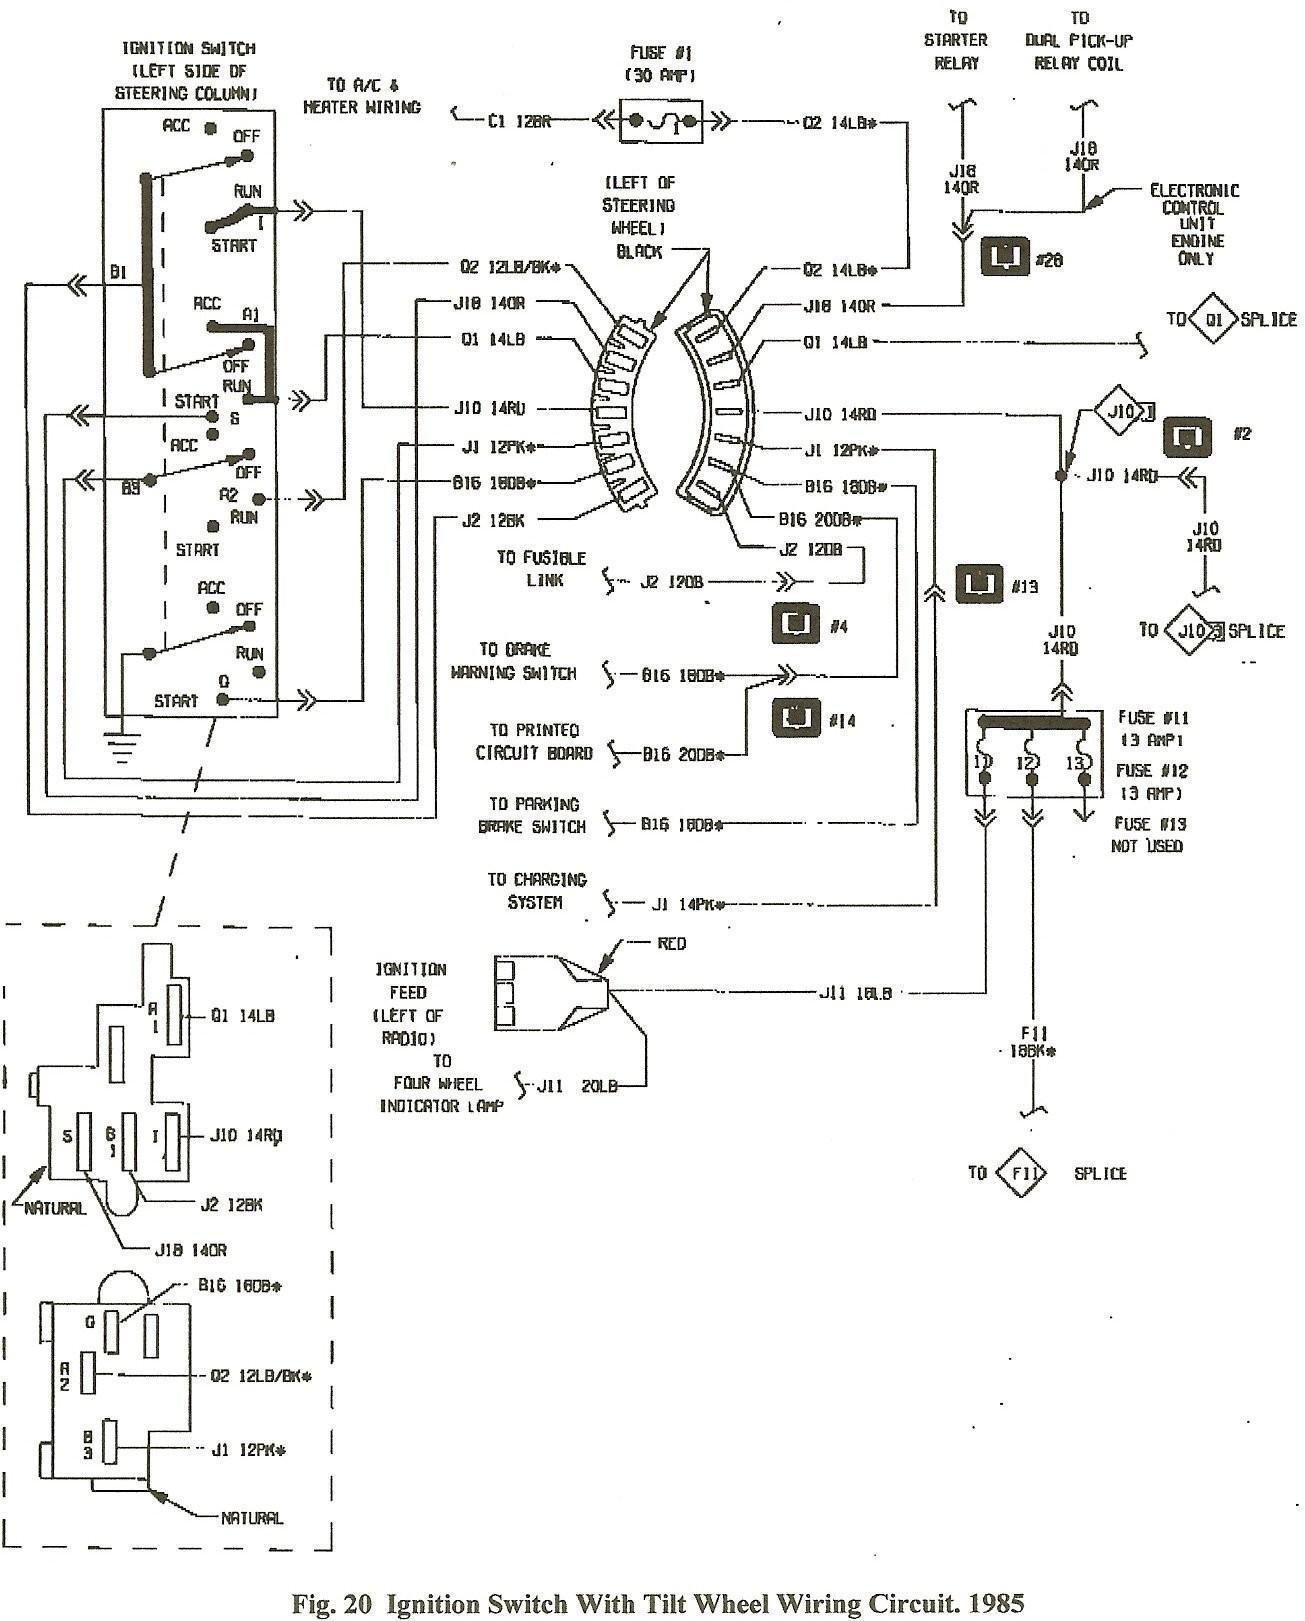 1998 Dodge Ram 1500 Engine Diagram 15 2001 Dodge Ram 1500 Pcm Collections Of 1998 Dodge Ram 1500 Engine Diagram